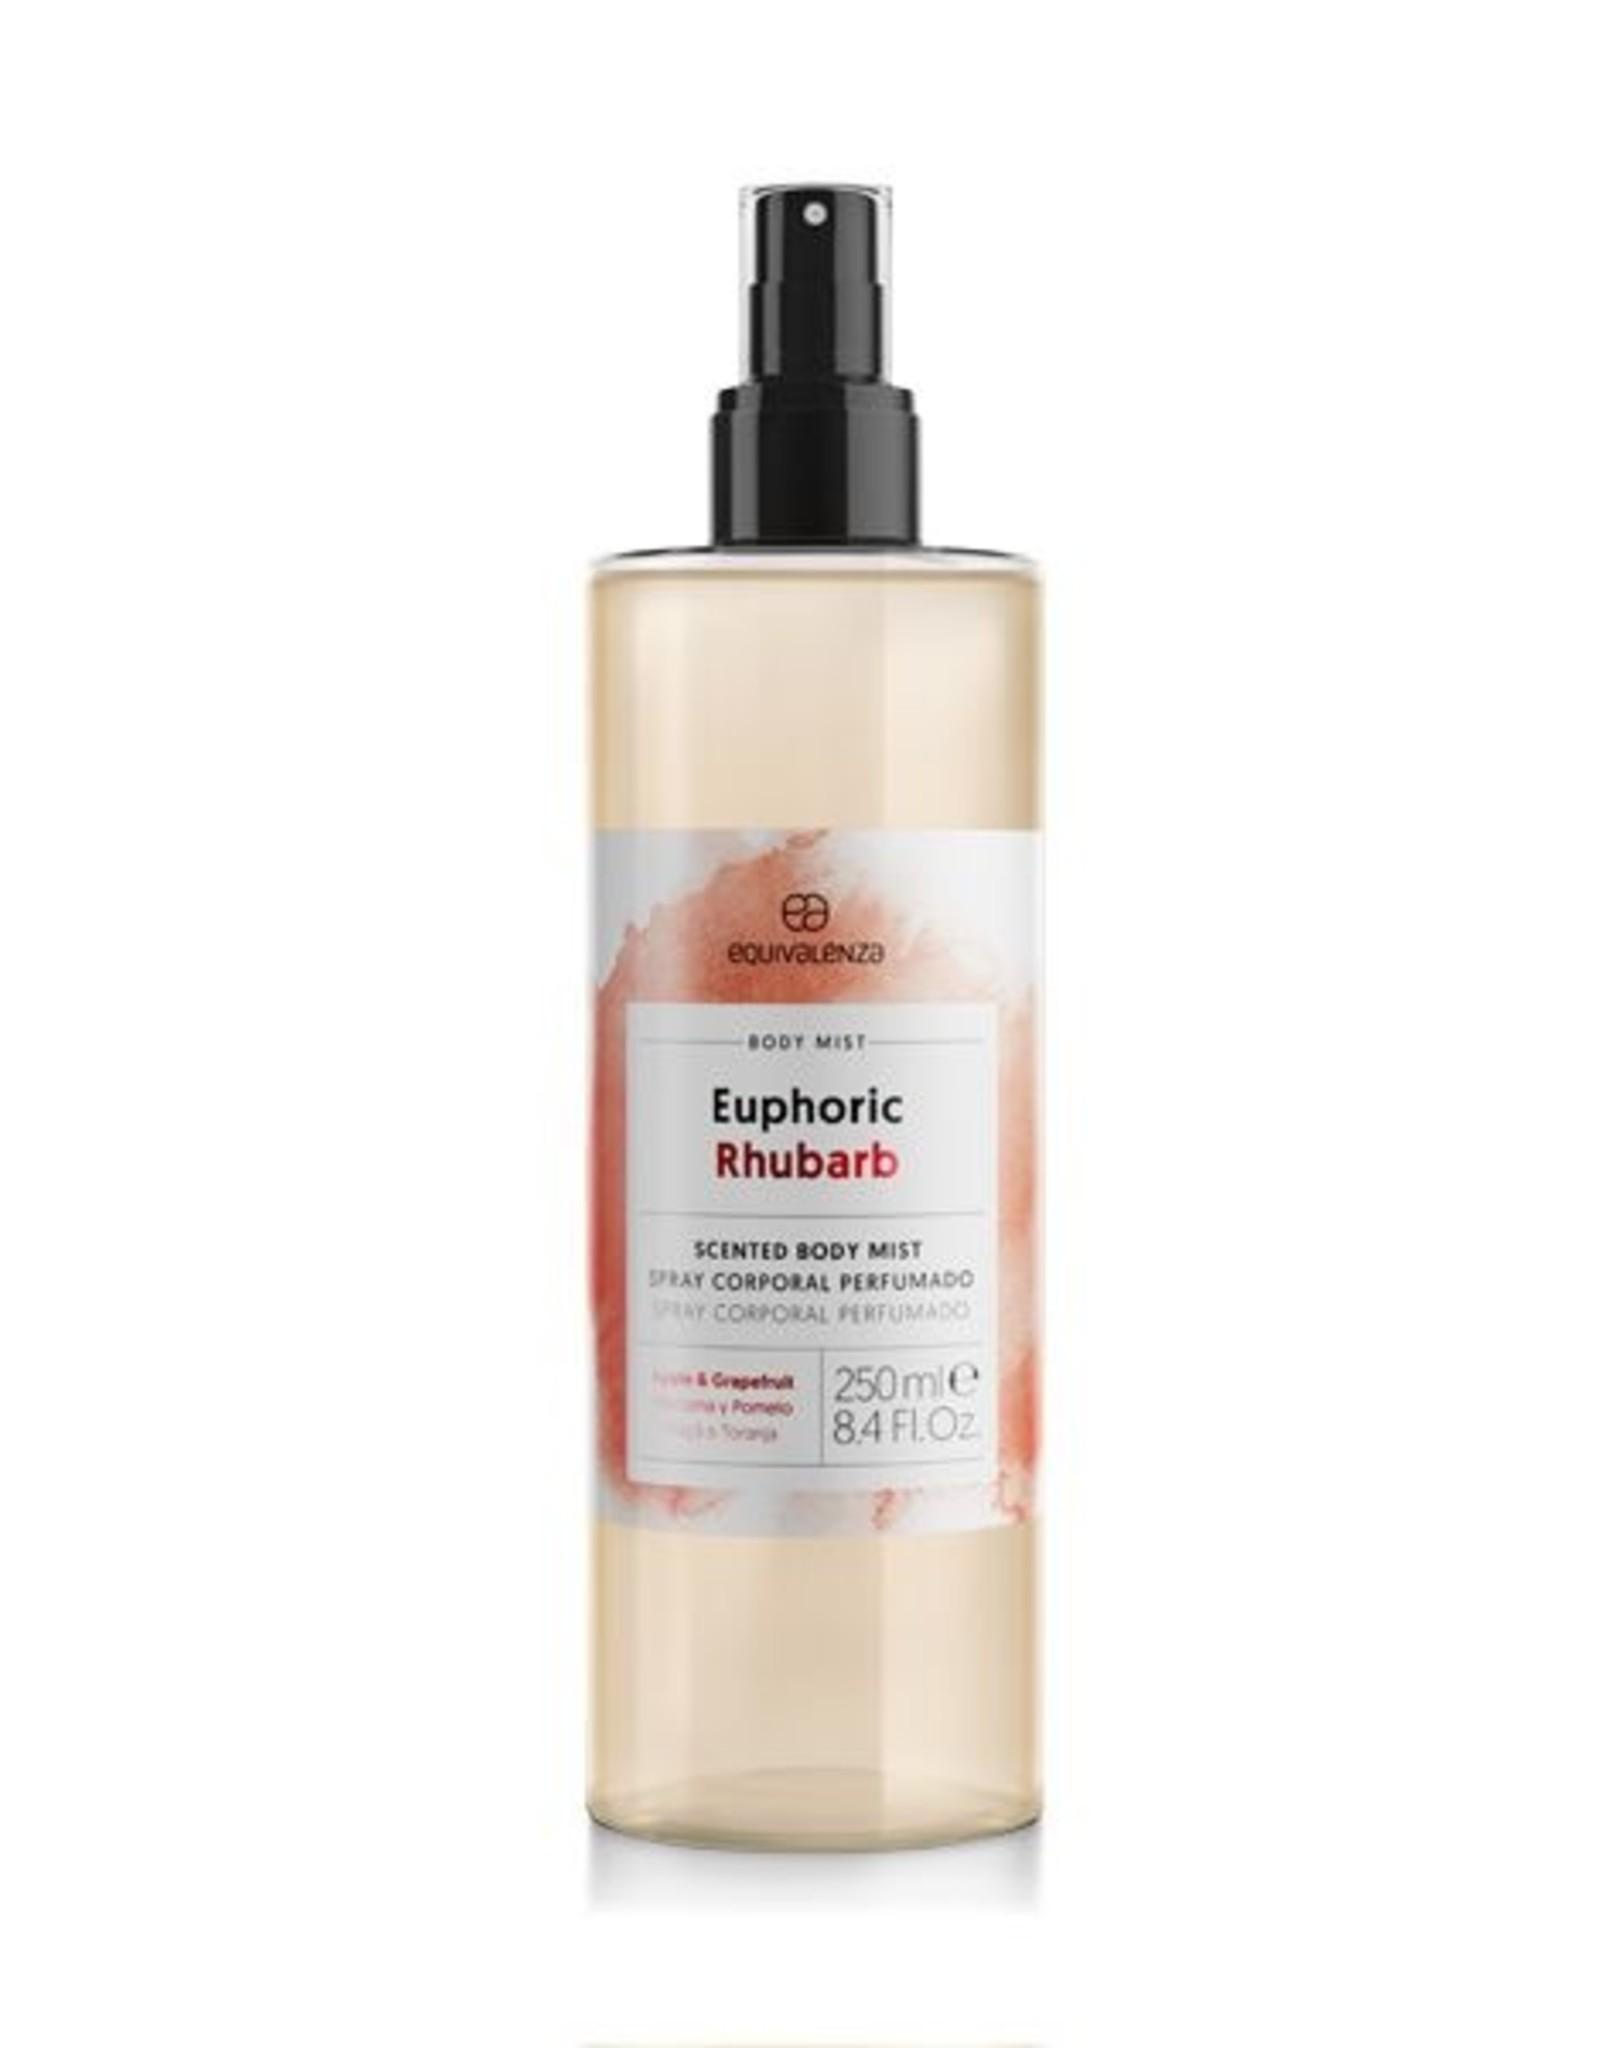 Equivalenza Euphoric Rhubarb Body Mist